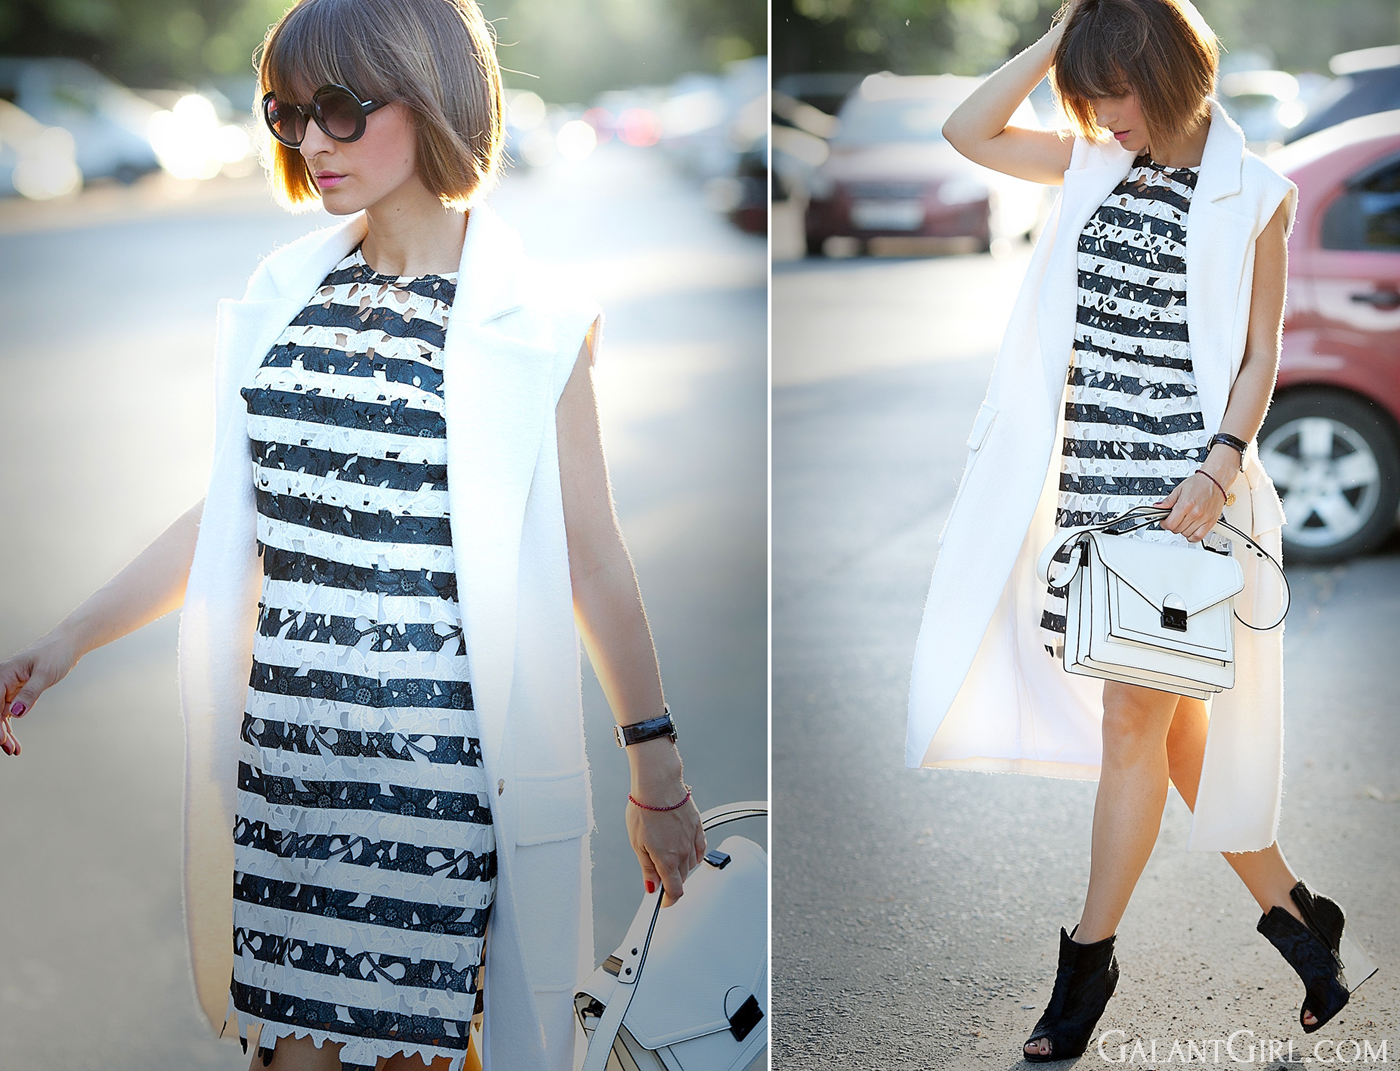 vestcoat_vestcoatoutfit_springoutfitideas_chicstyle_chicsrtreetstyleblog_asoslacedress_galantgirl